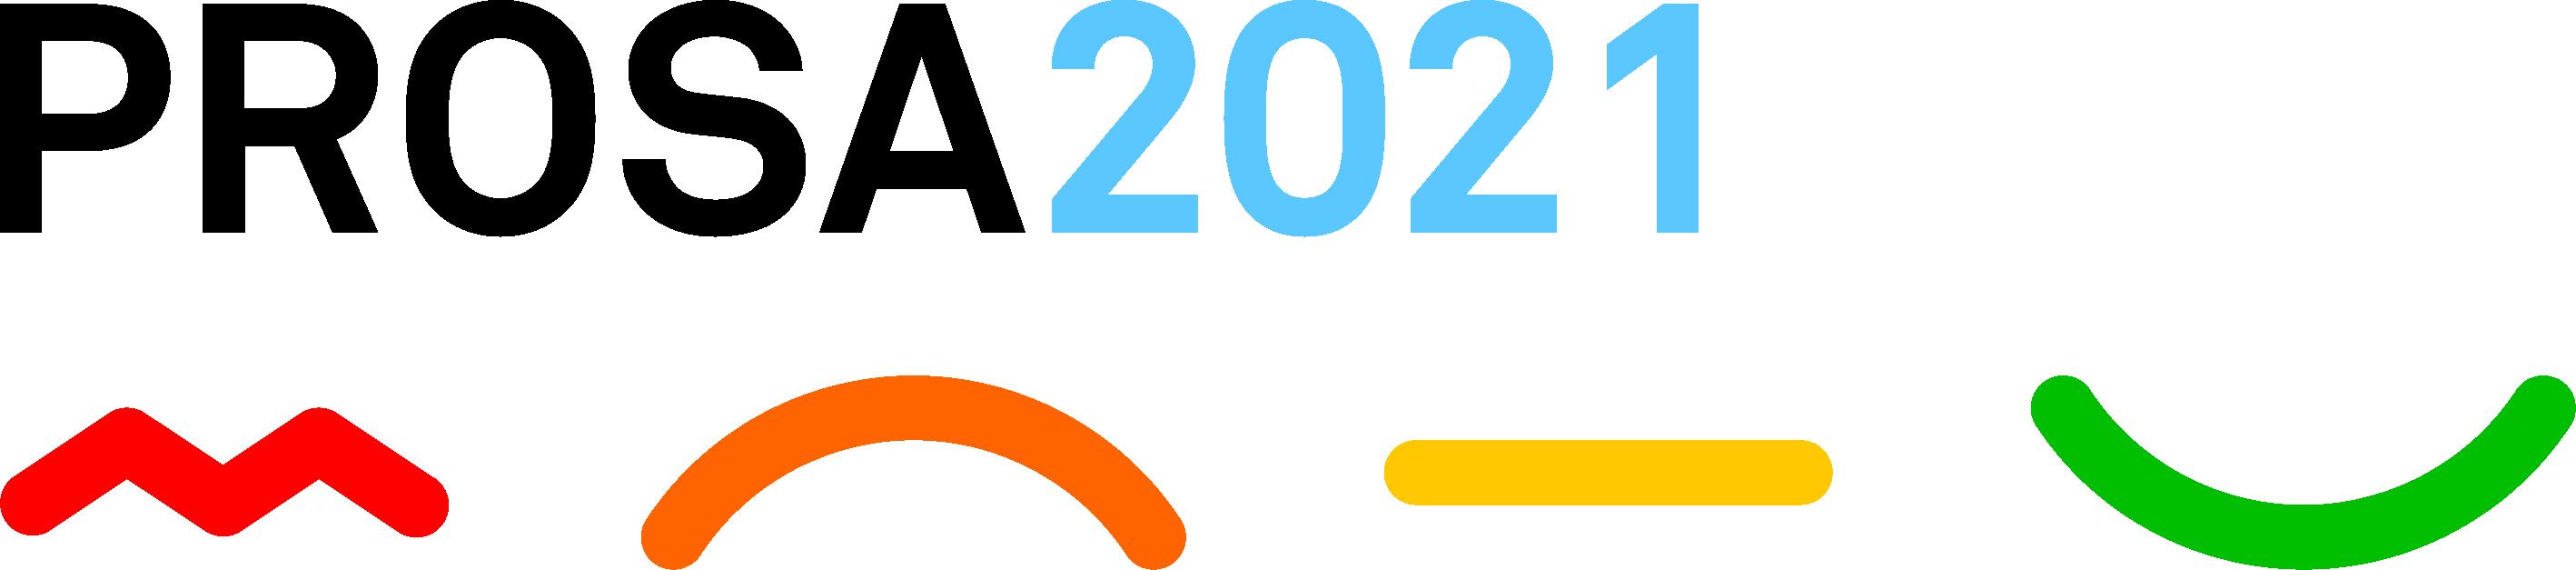 PROSA 2021_LOGO_RGB